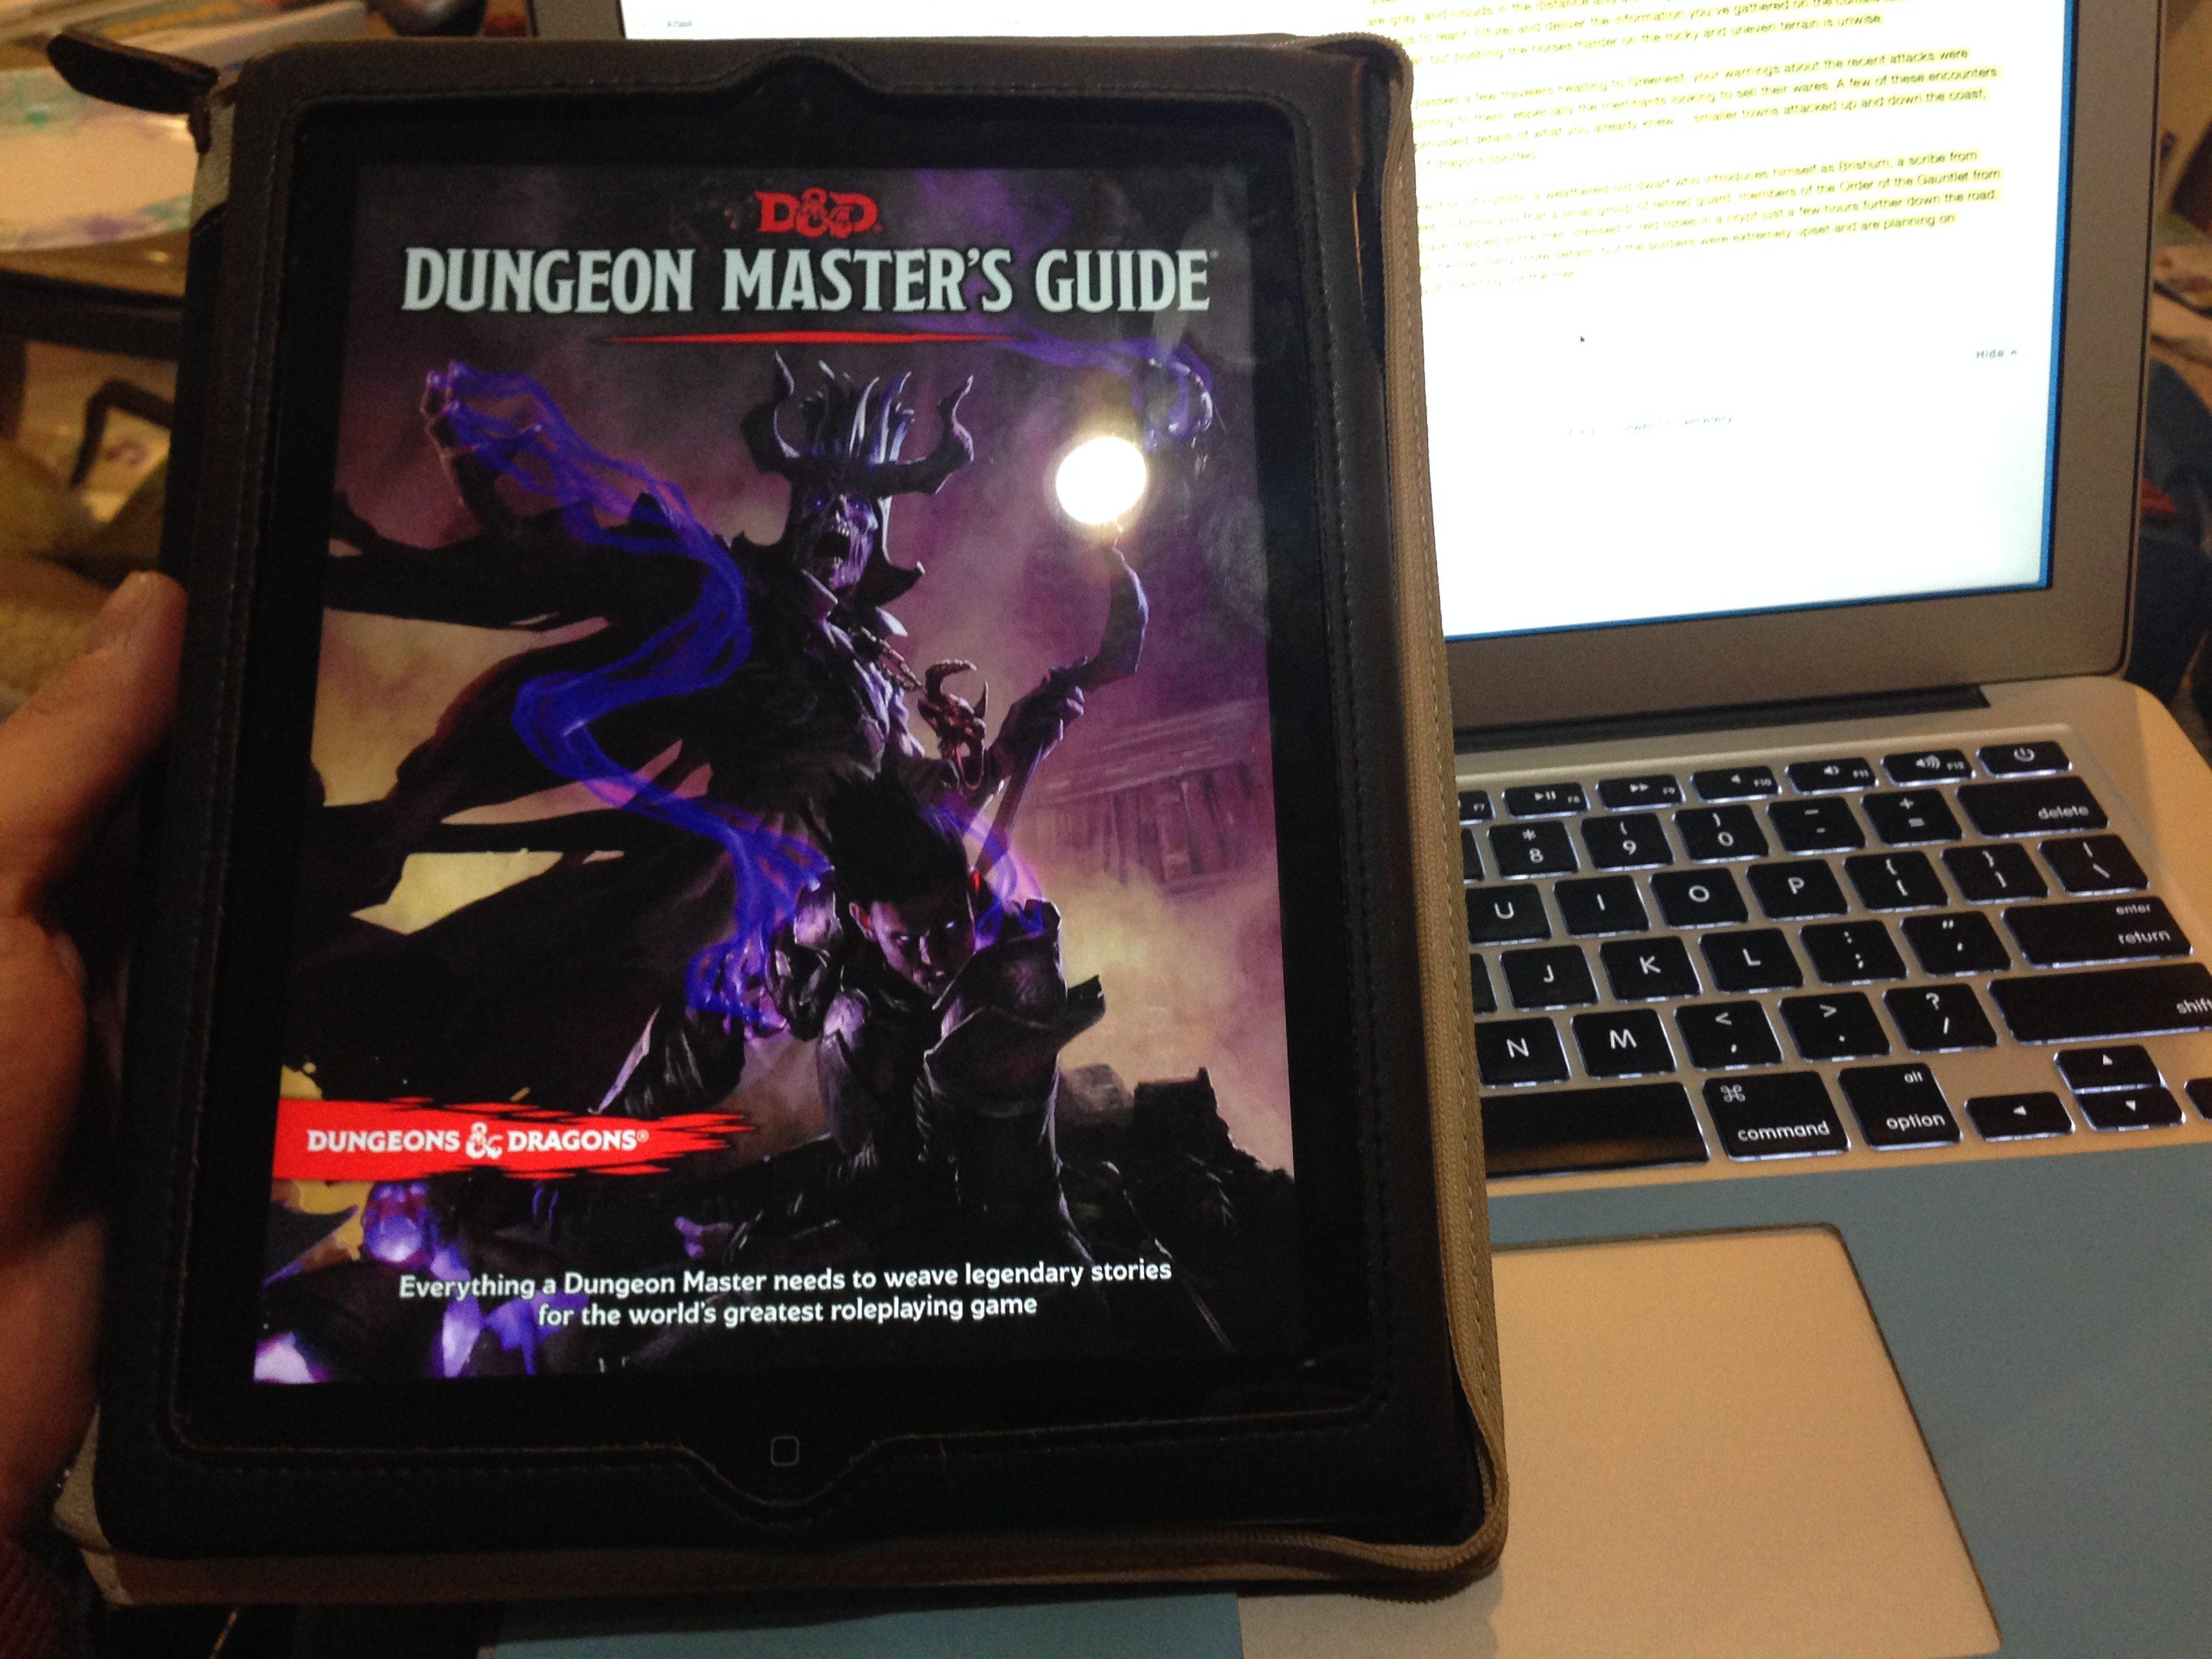 DMG on iPad